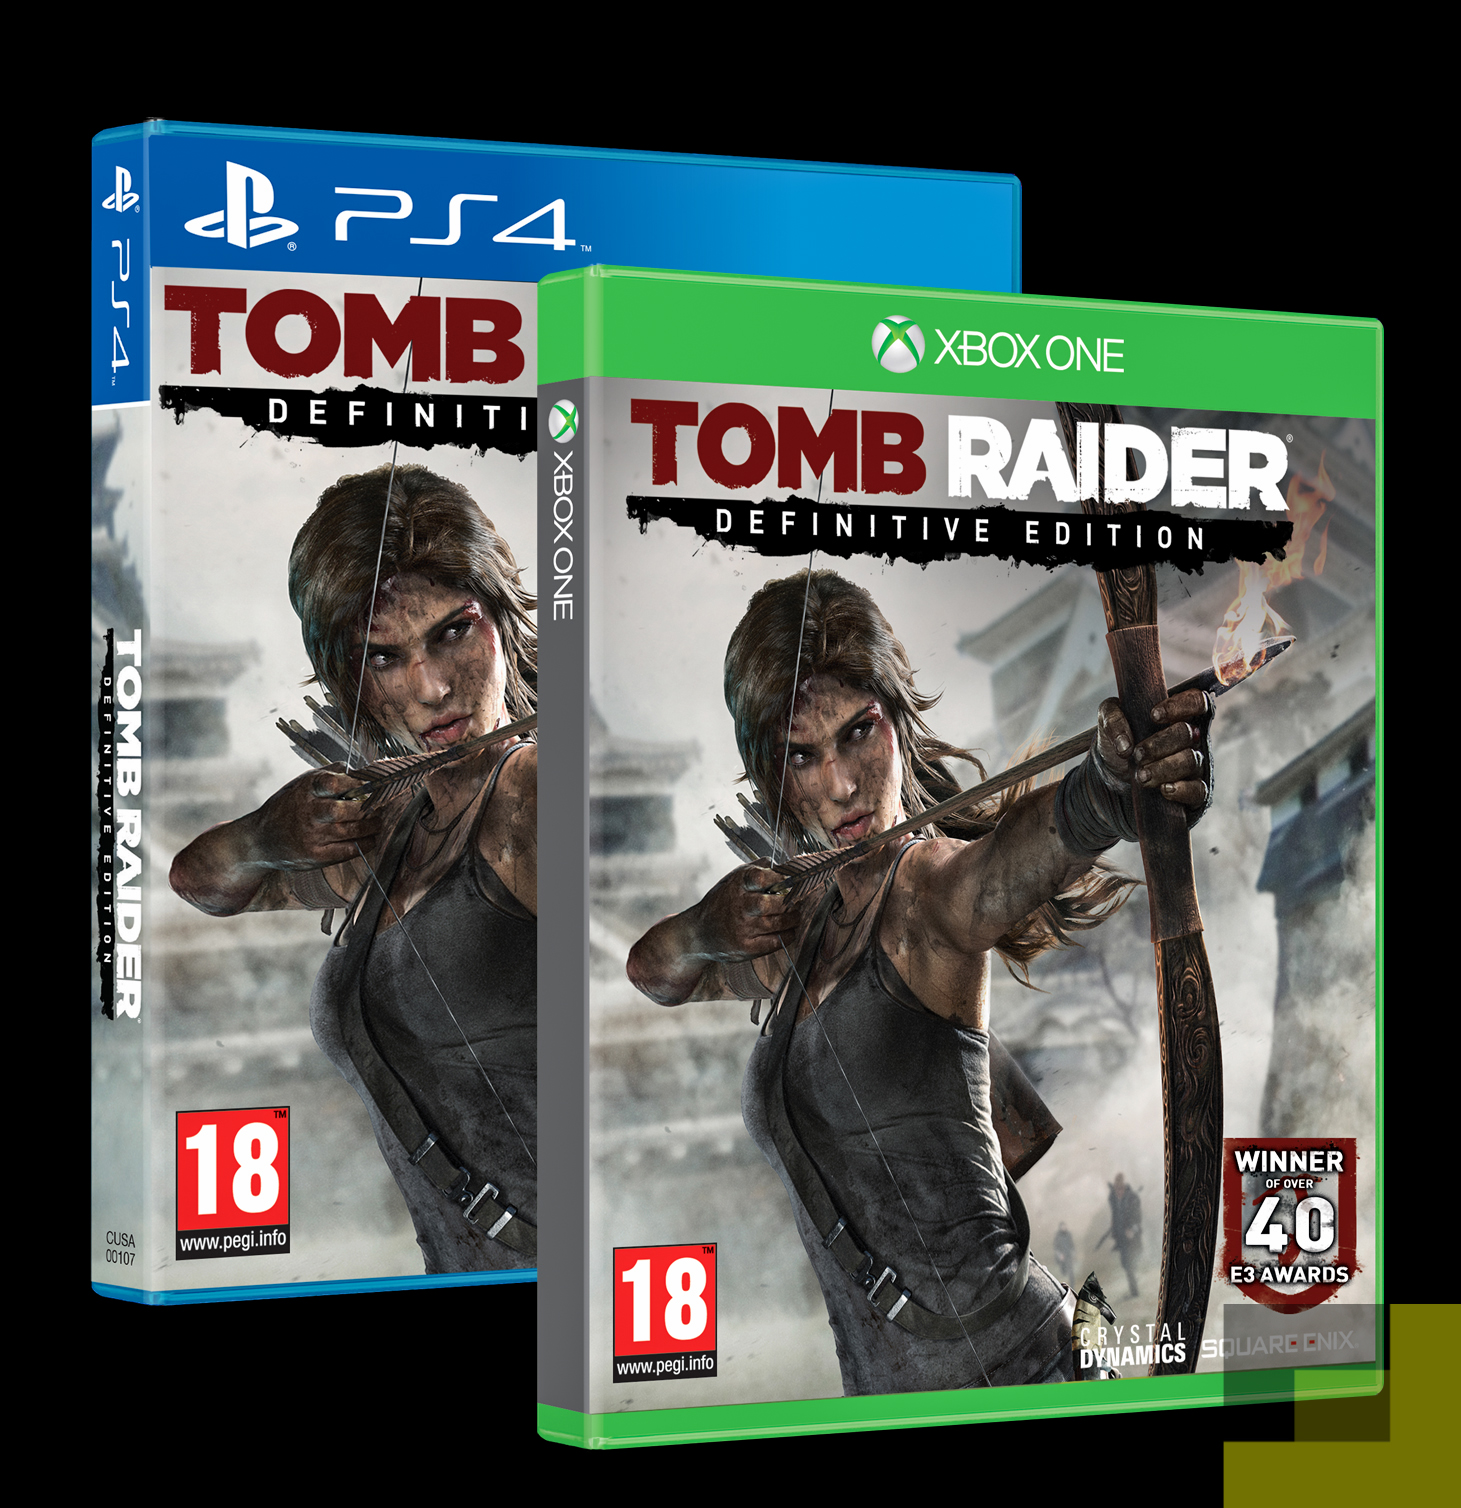 tomb raider game Rekon (2 of 1)